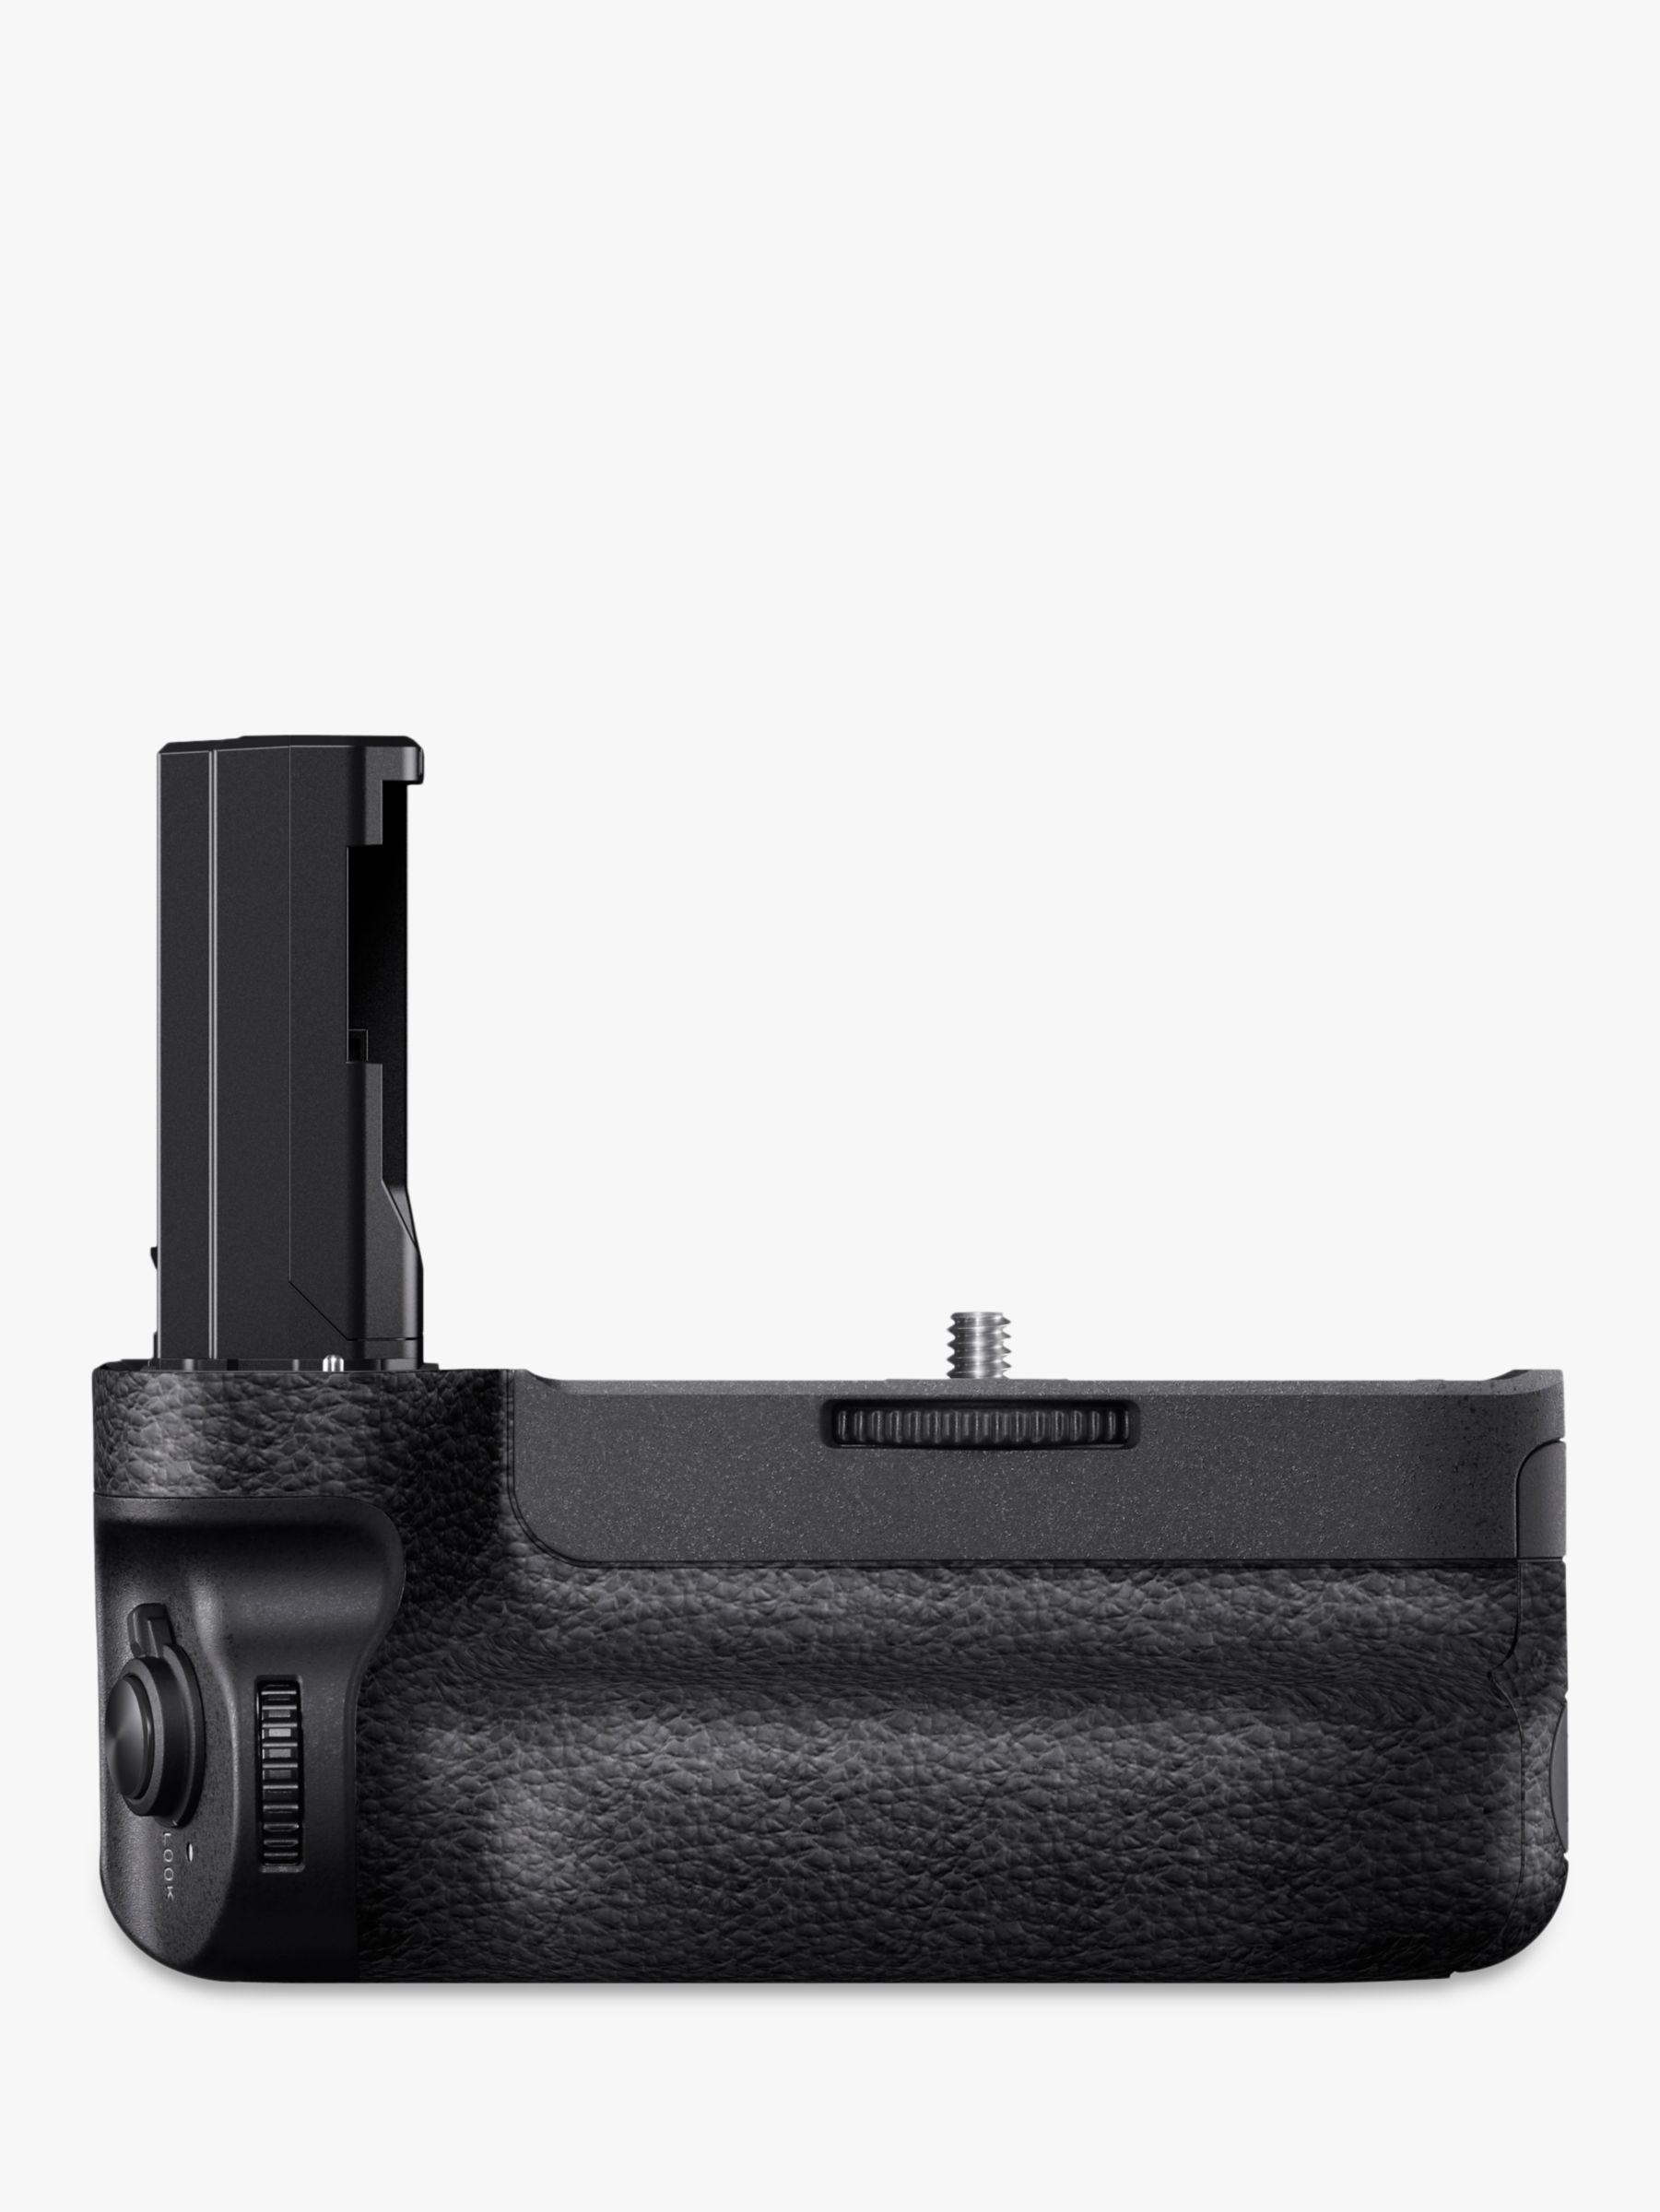 Sony Sony VGC3EM Vertical Battery Grip for Alpha 9, Alpha 7 R III & Alpha 7 III